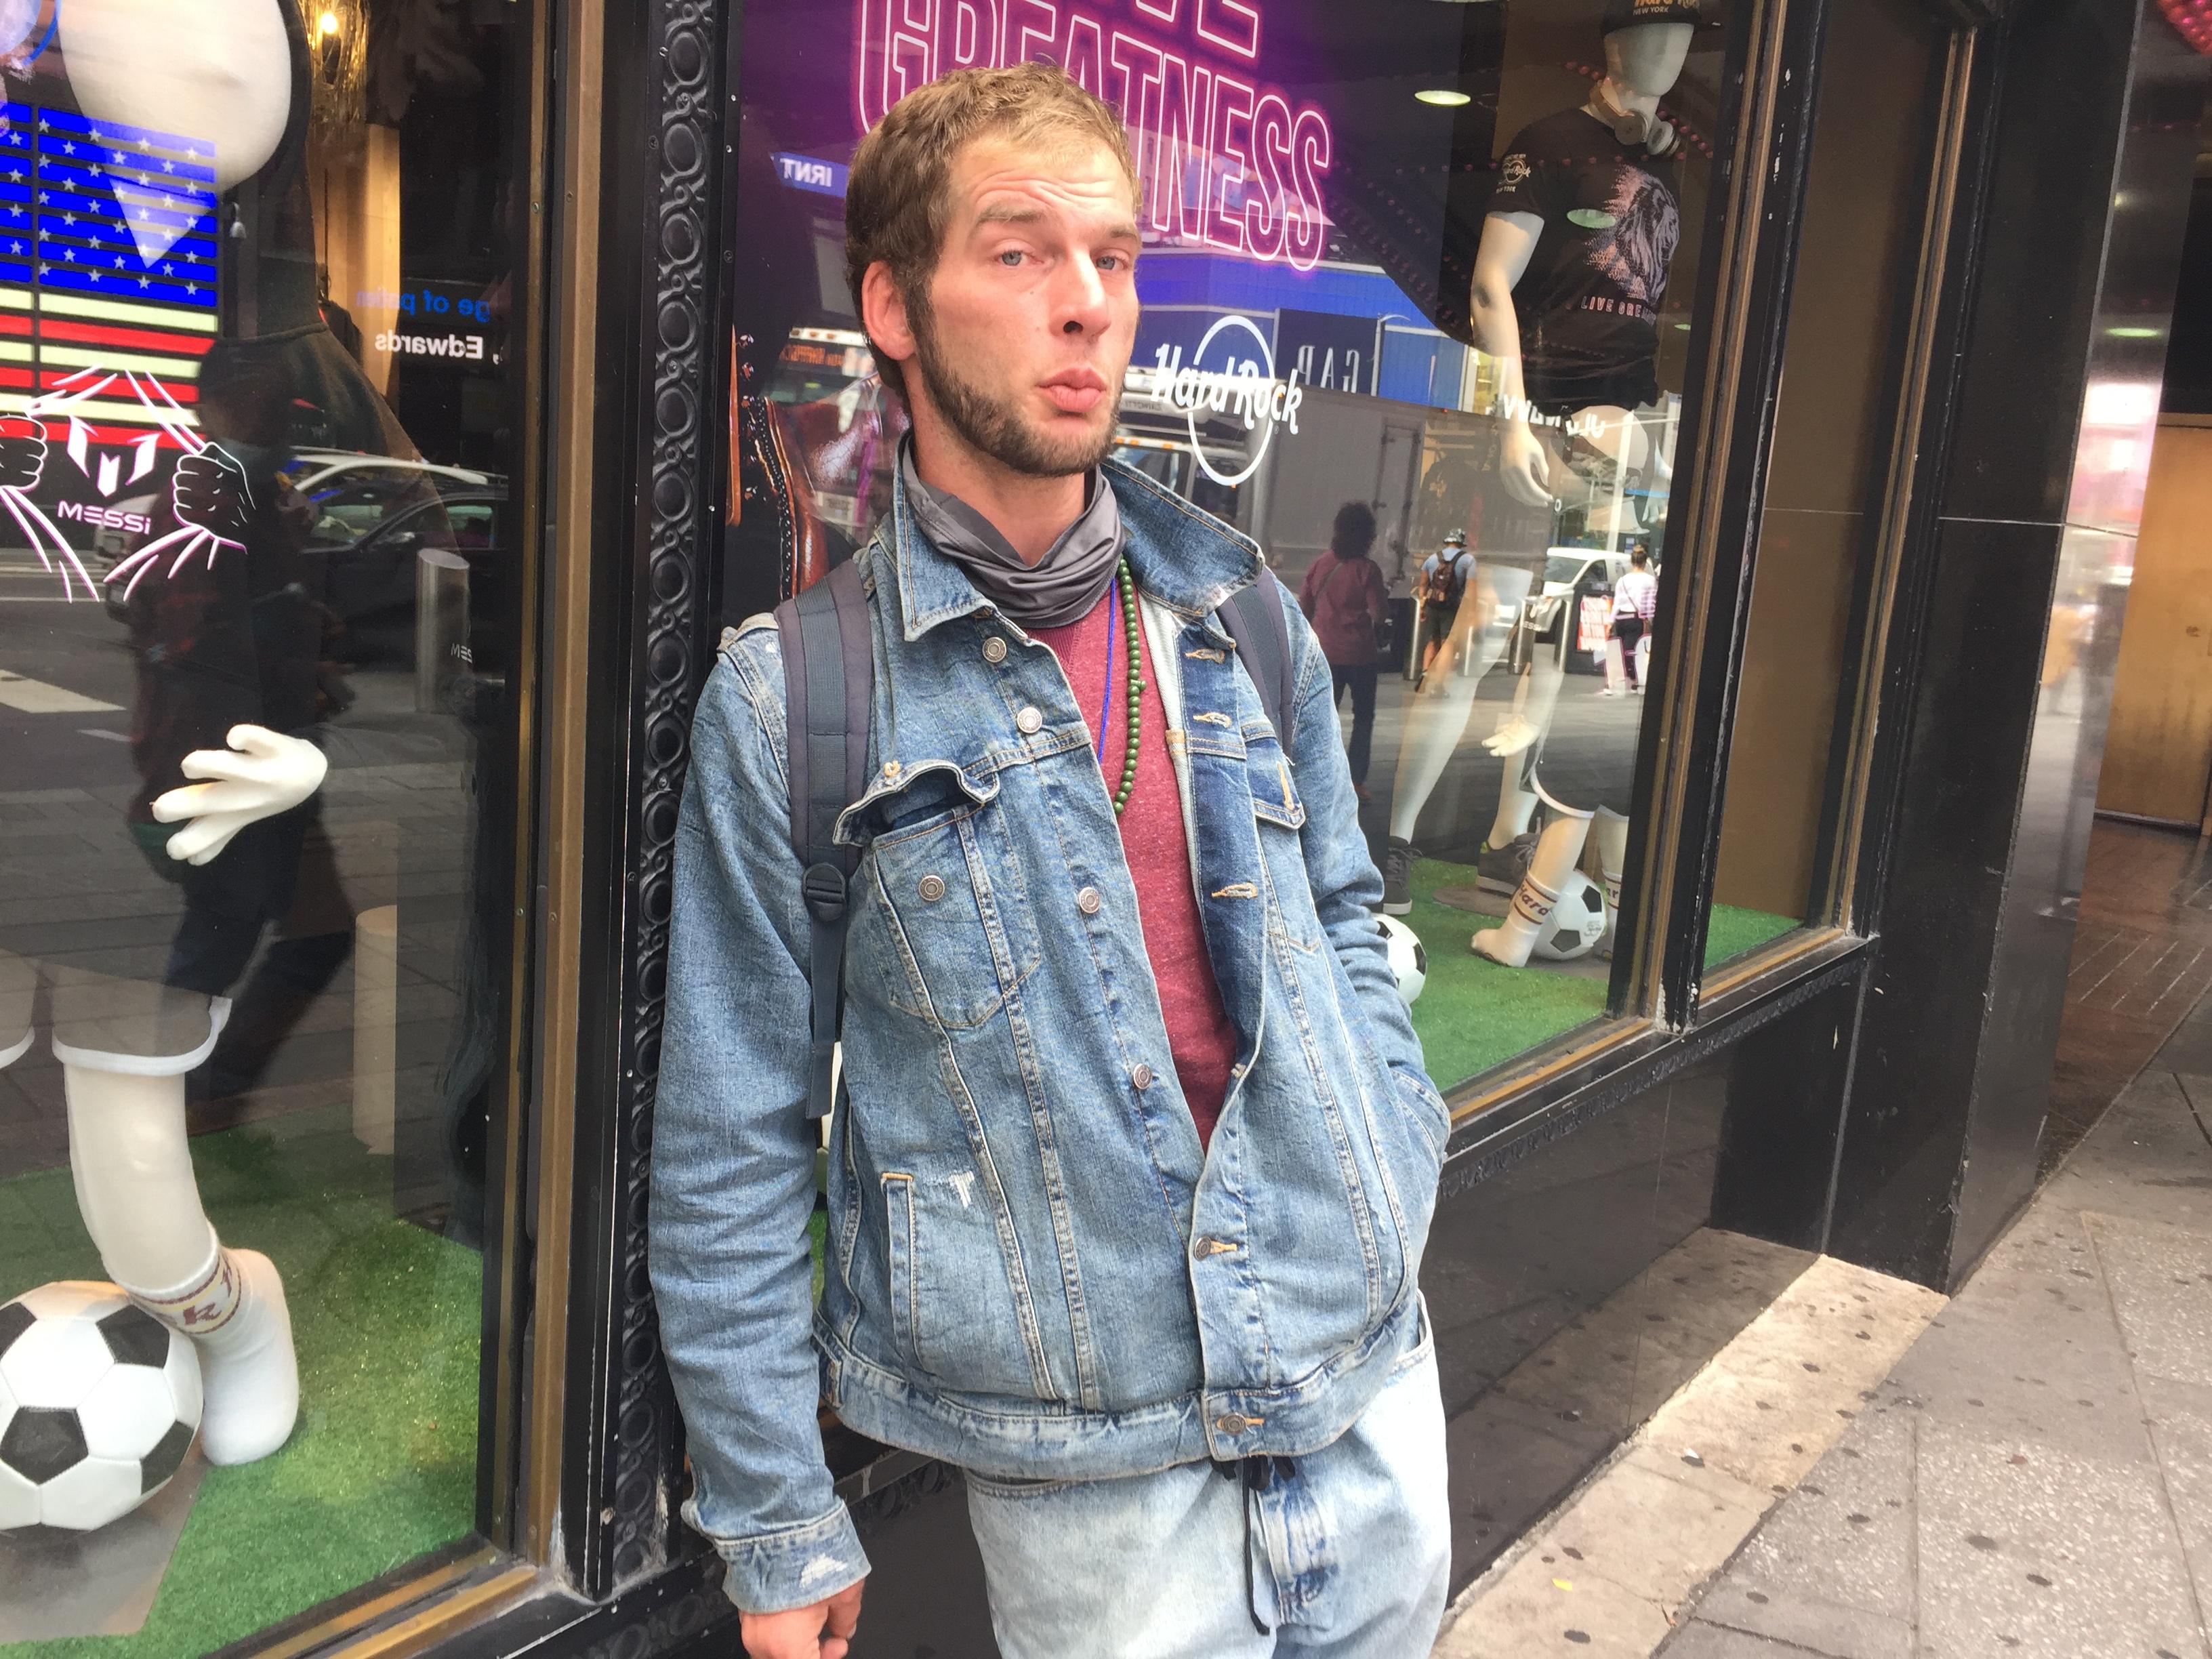 Benjamin, a white man wearing a denim jacket, outside a store